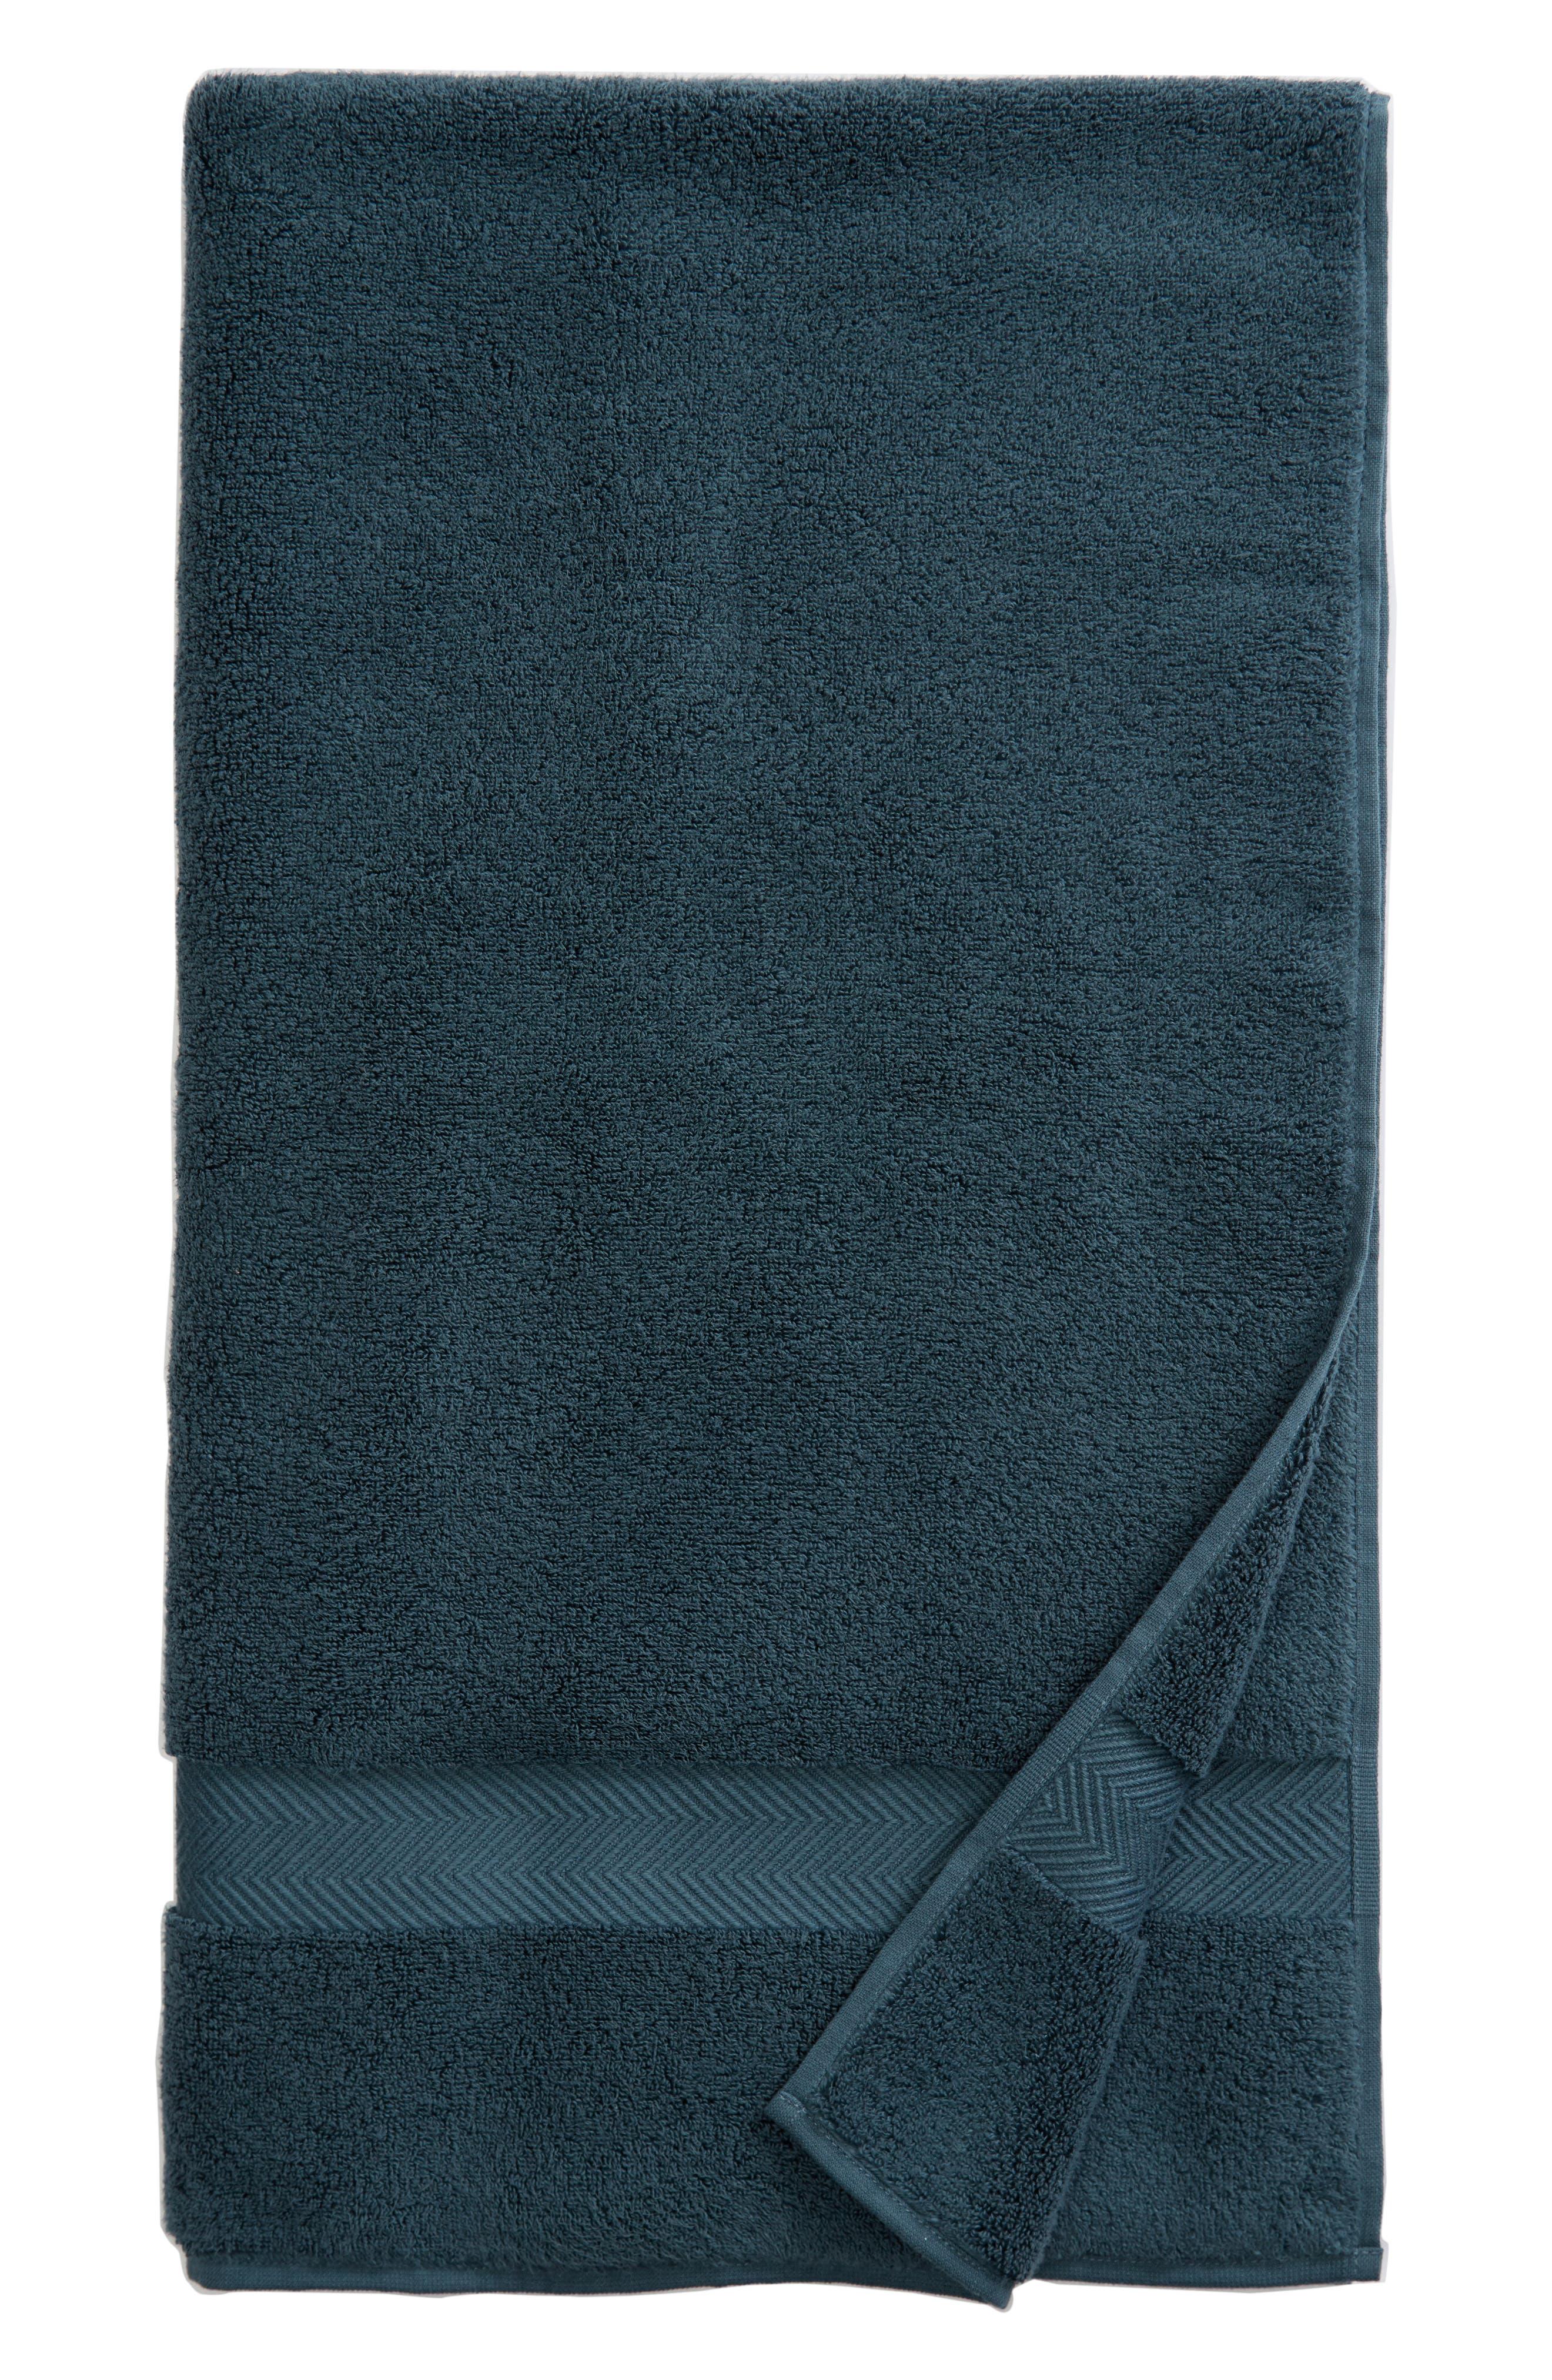 Hydrocotton Bath Towel, Main, color, TEAL GAZER